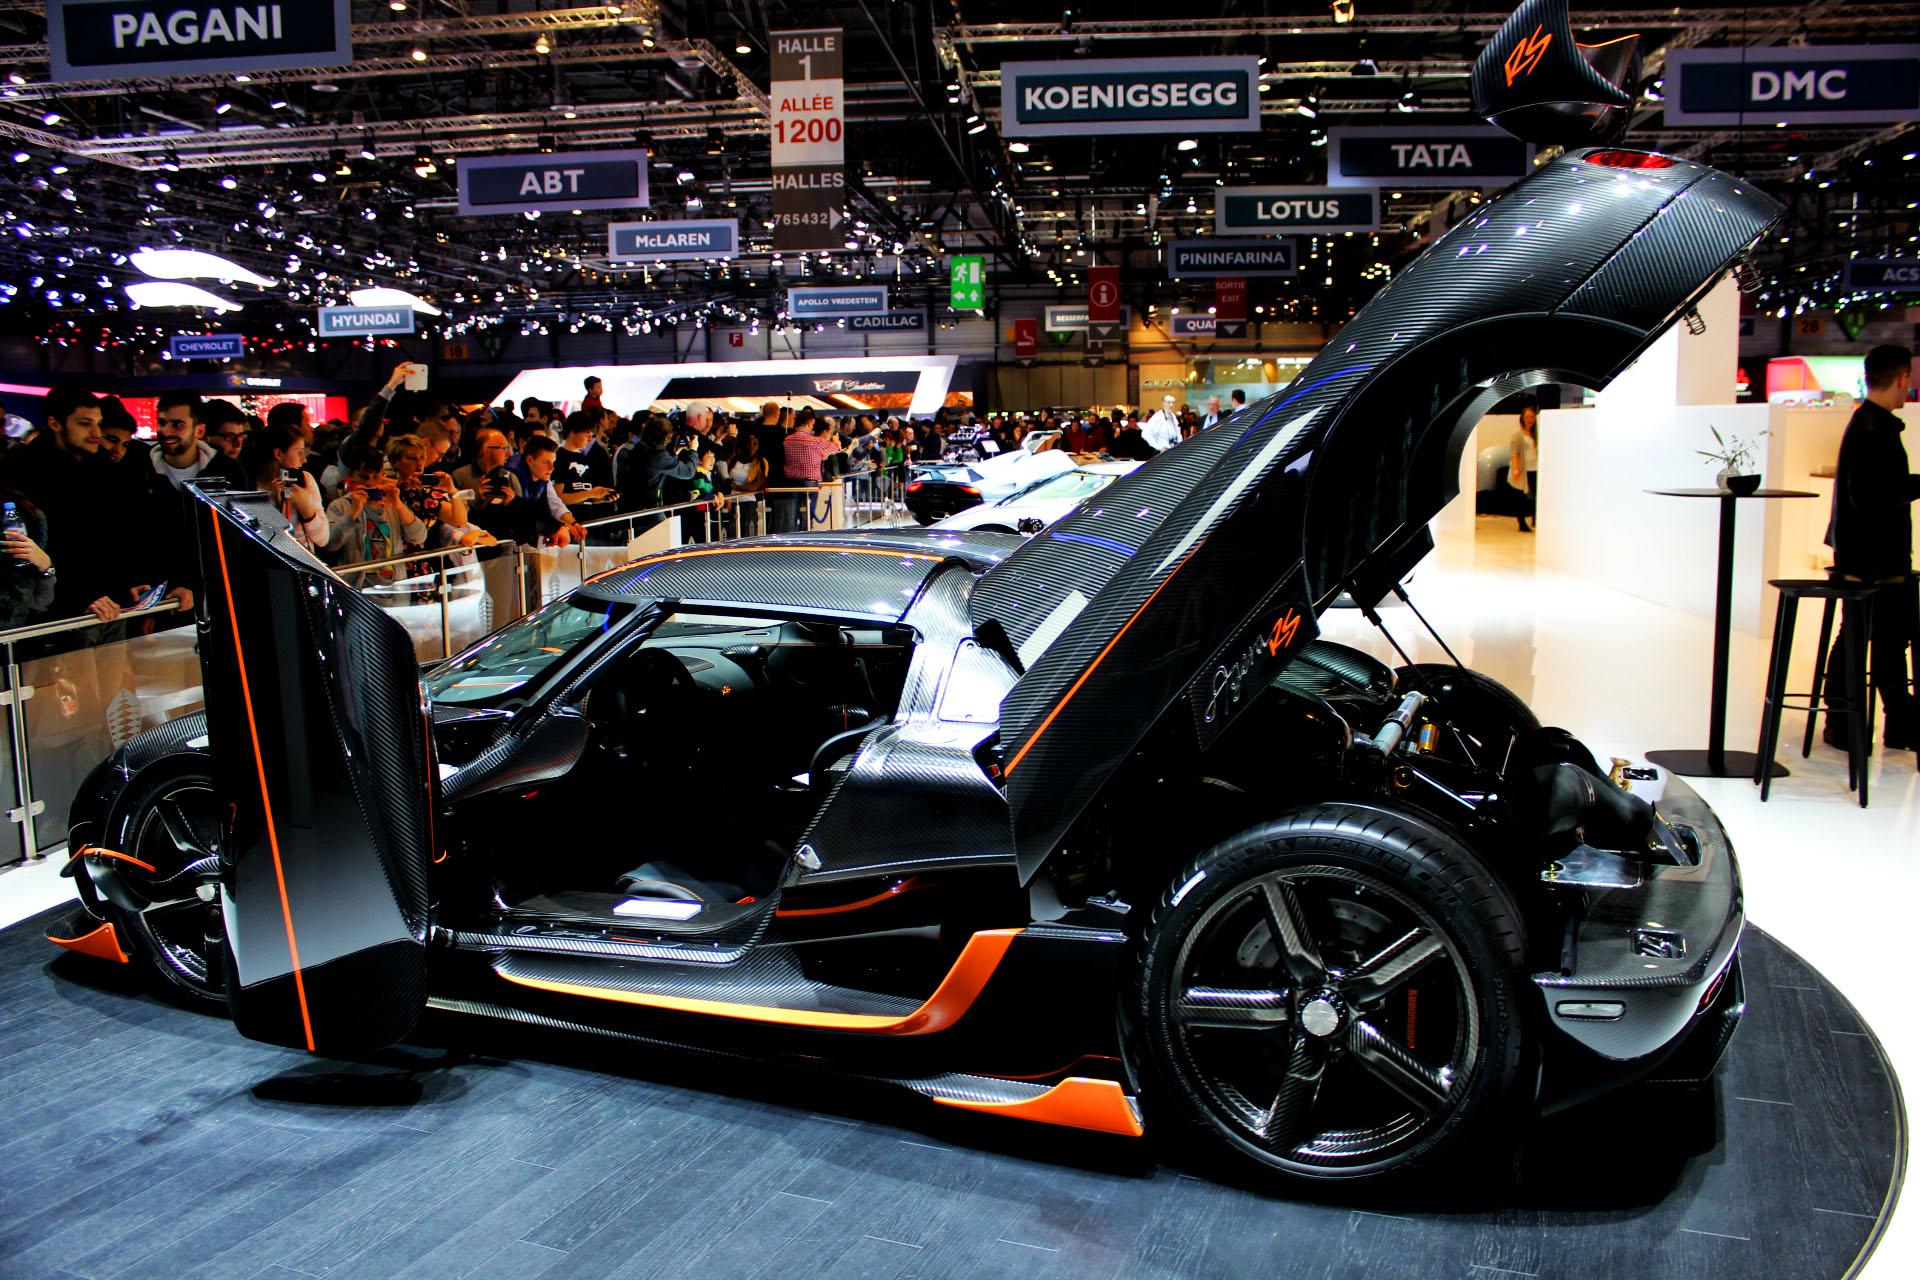 Agera RS - Koenigsegg